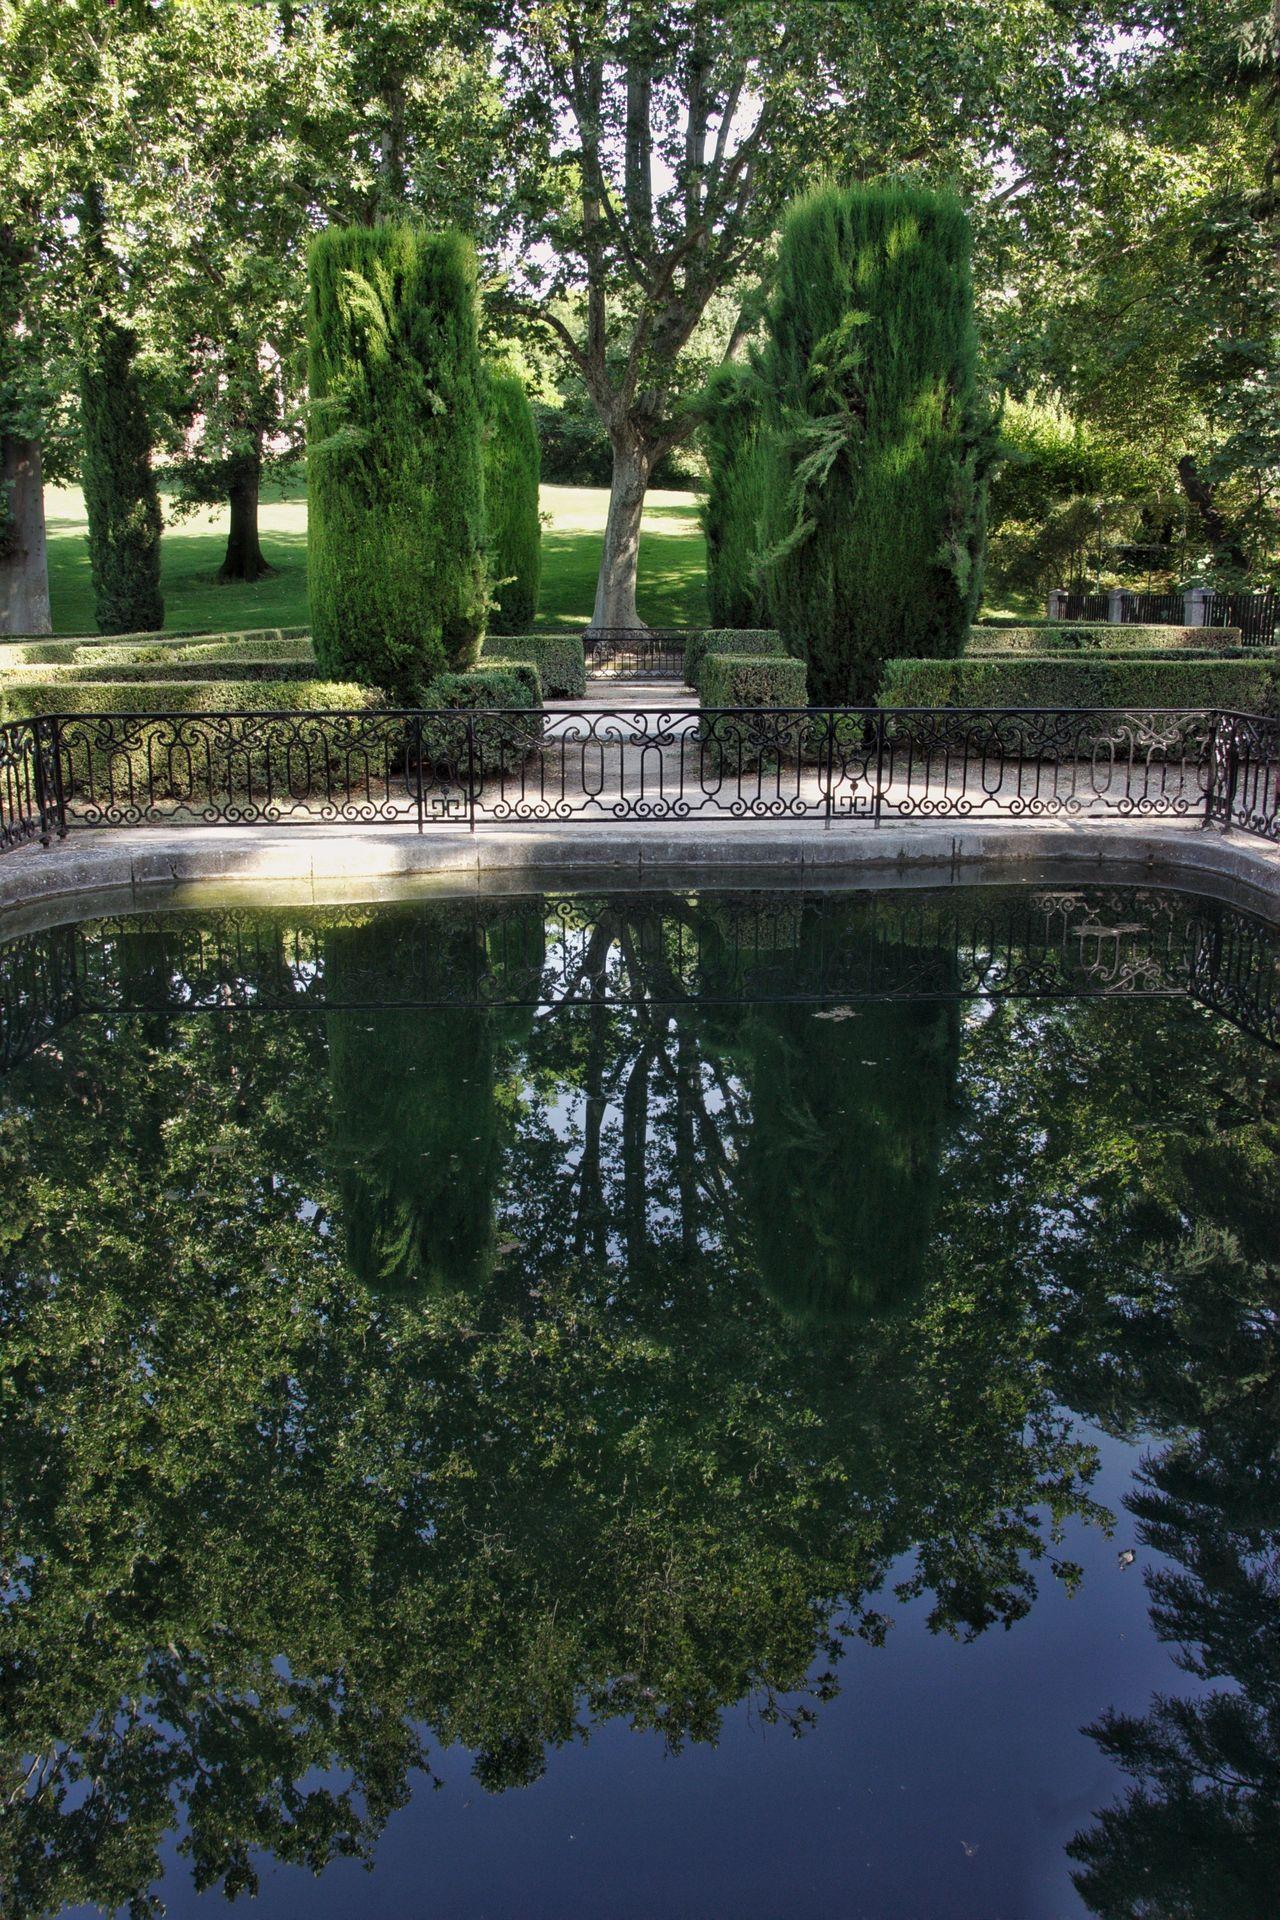 Parque de El Capricho en Madrid , SPAIN Tree Reflection Water Park - Man Made Space Nature Growth Green Color Waterfront Beauty In Nature Outdoors No People Garden Españoles Y Sus Fotos Flower